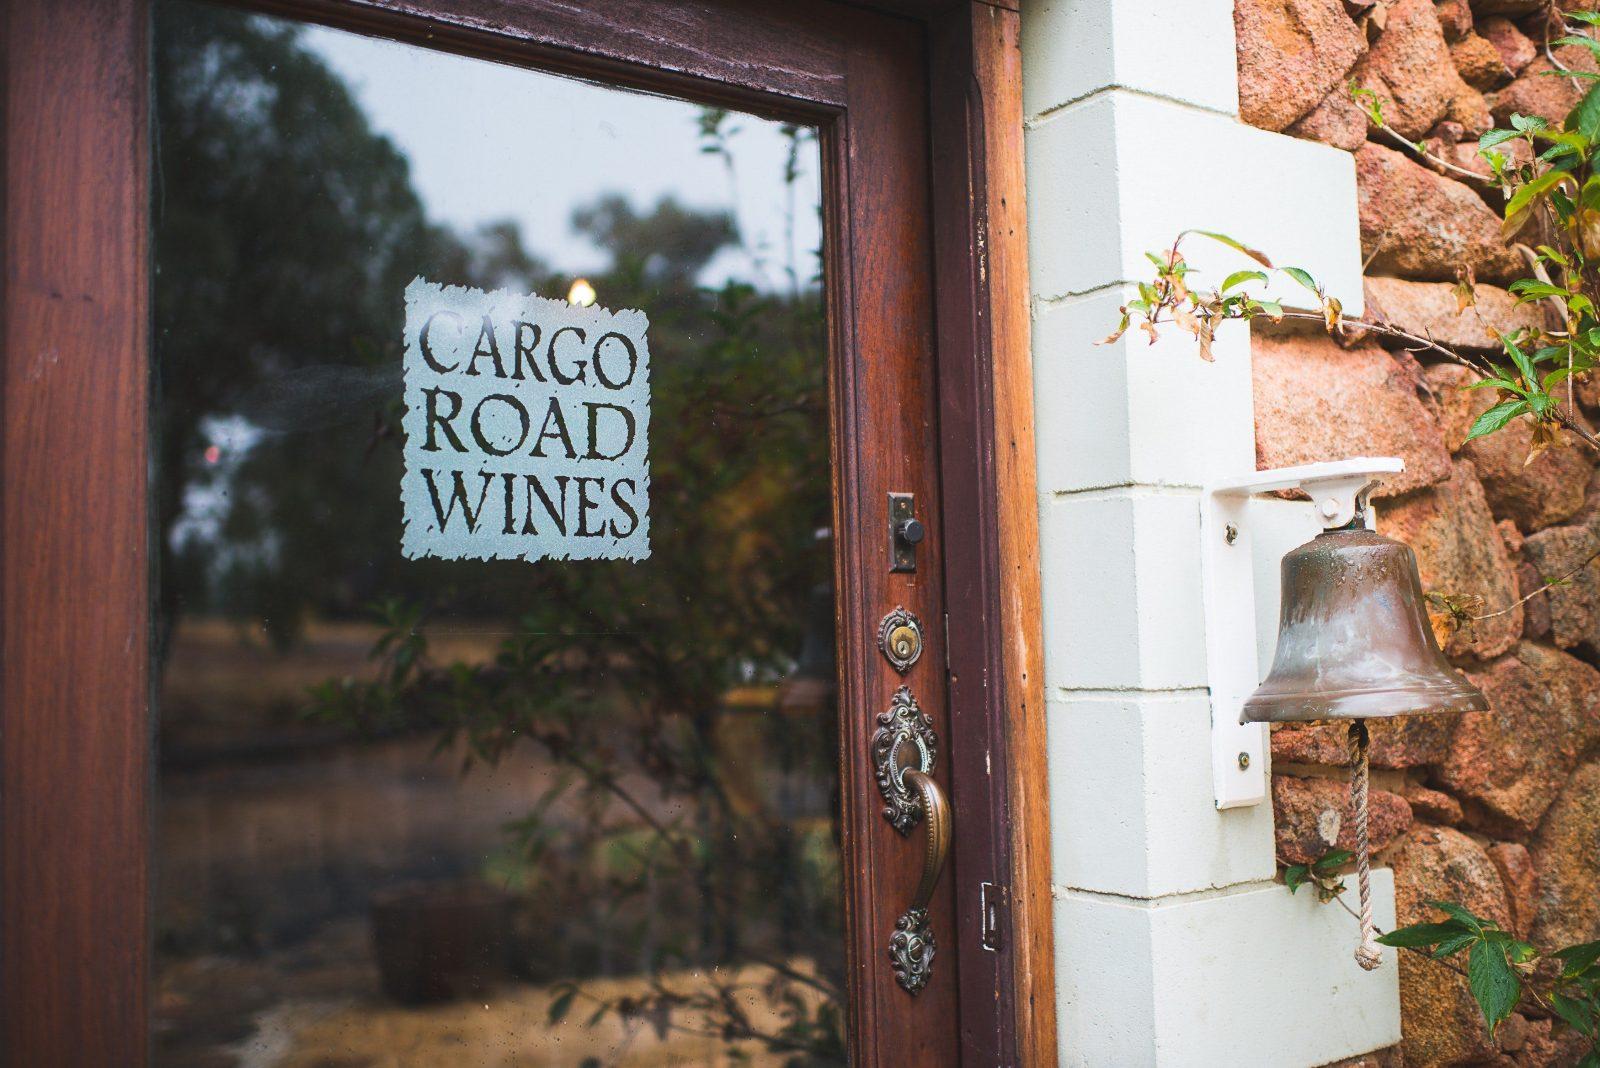 Cargo Road Wines